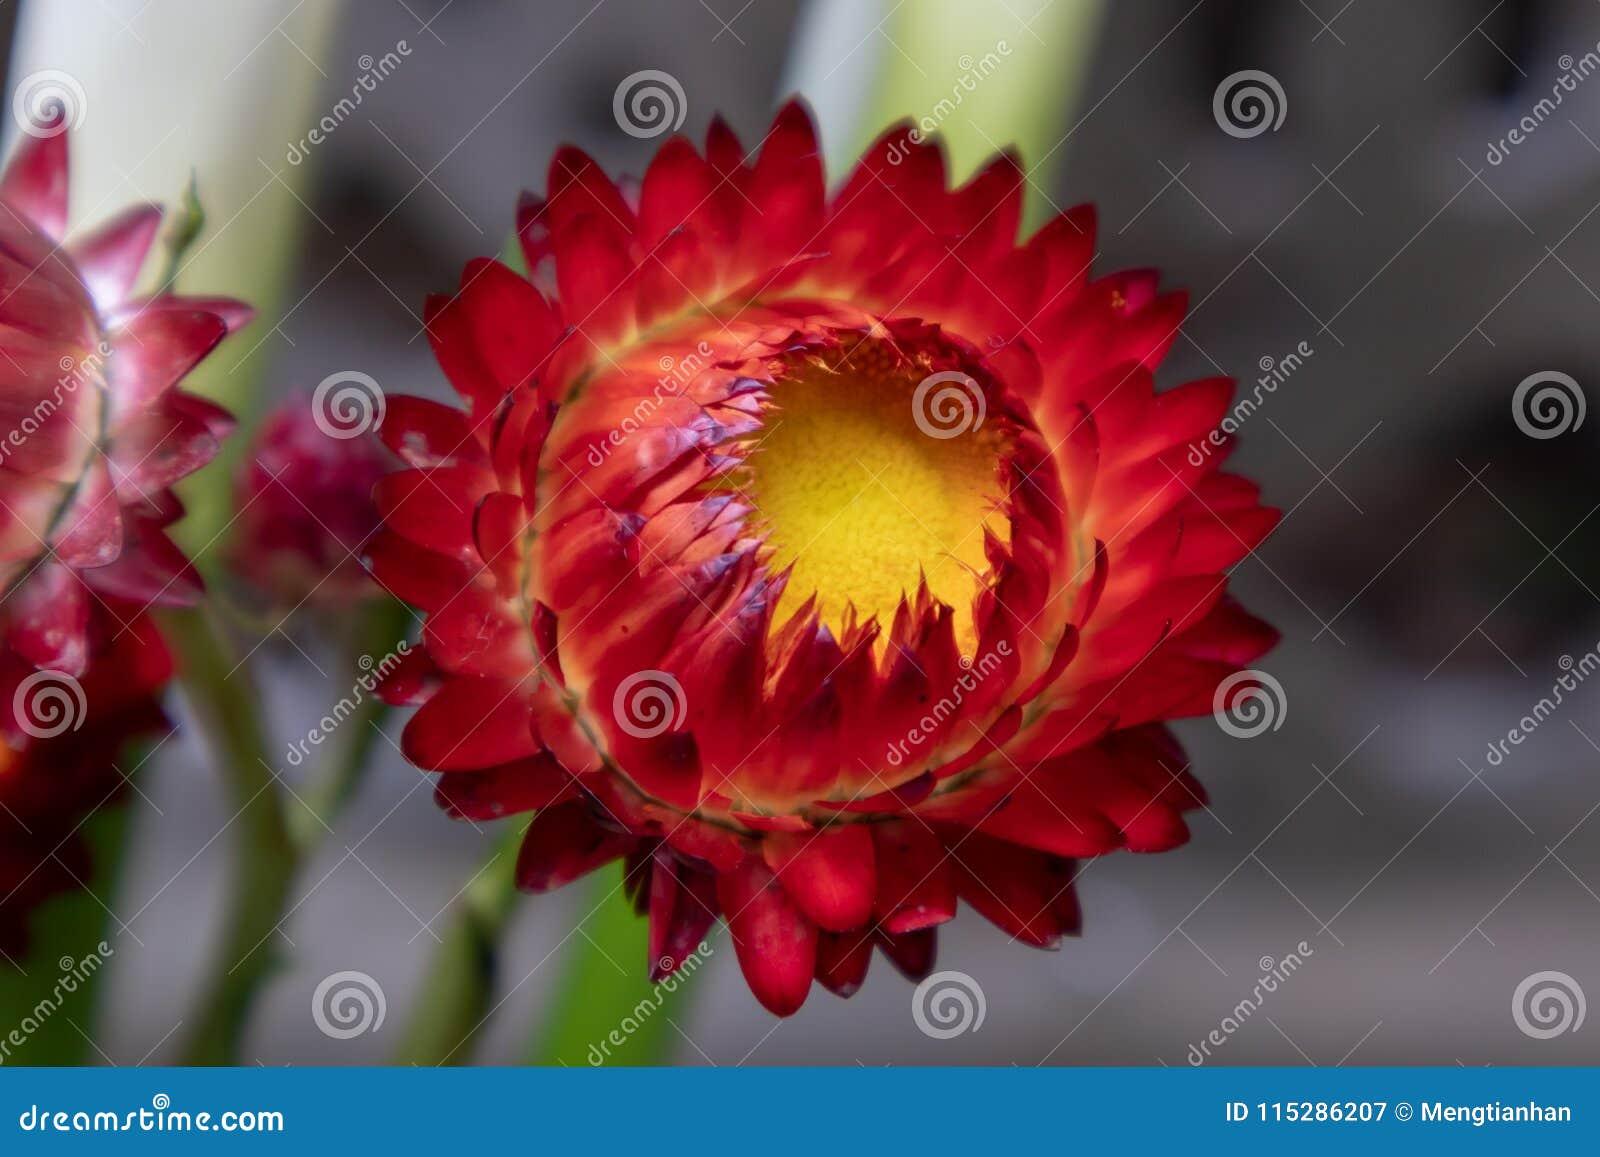 Helichrysum Bracteatum Fresh Cut Flowers Stock Image Image Of